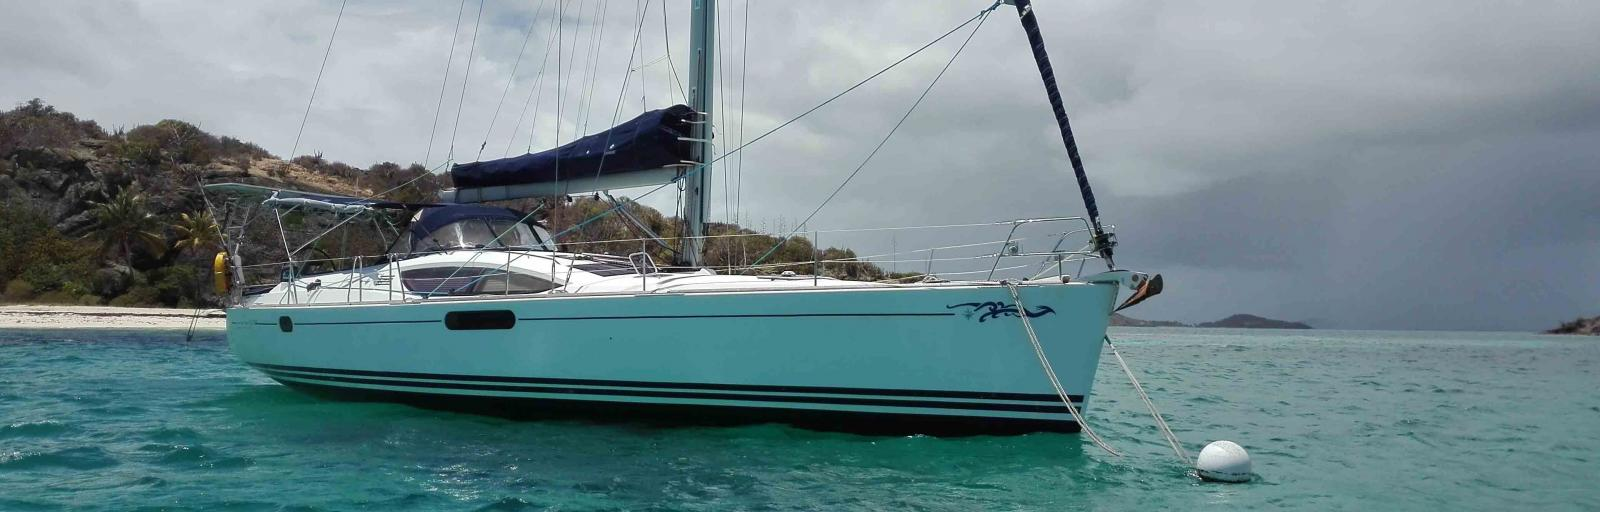 AYC – Yacht broker - SUN ODDYSEY 50 DS PERFORMANCE